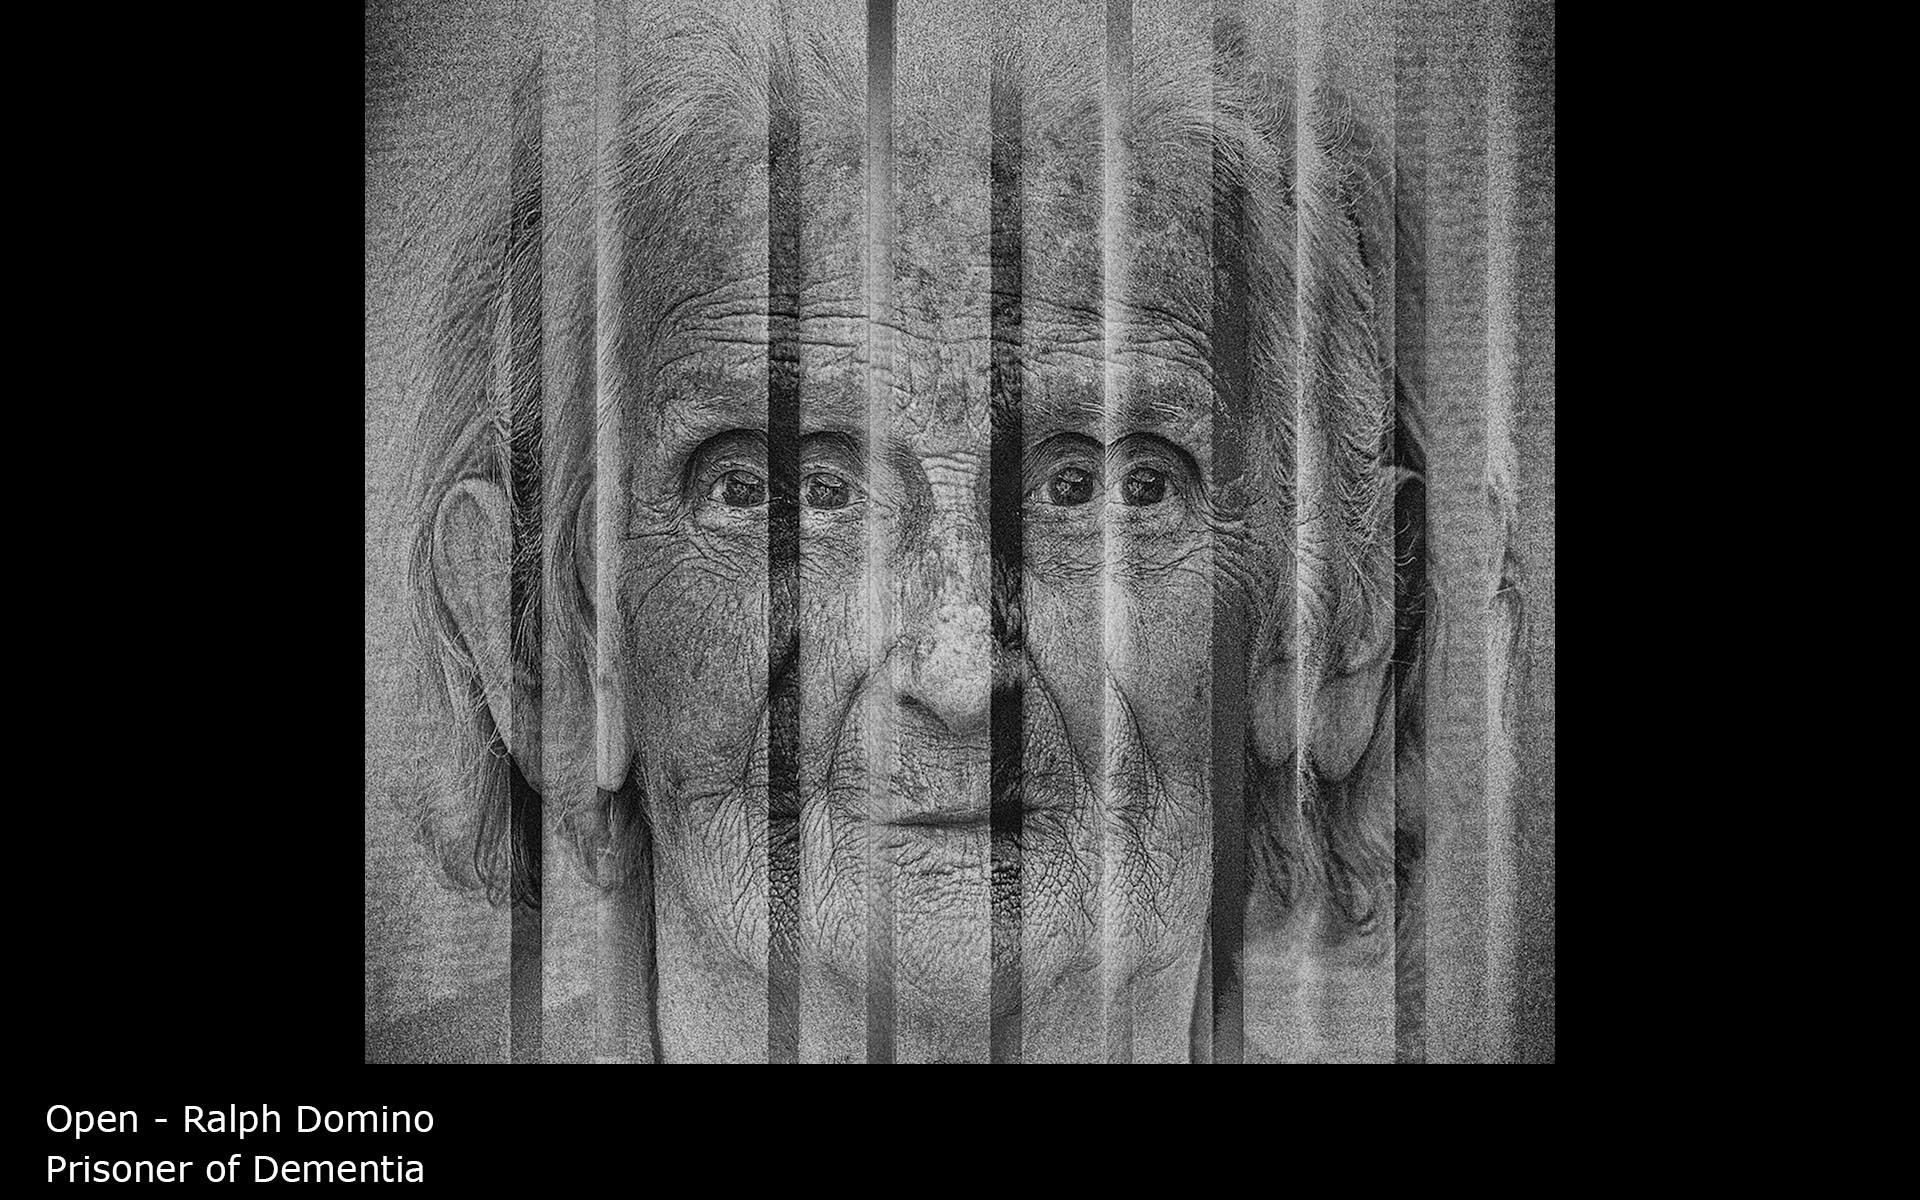 Prisoner of Dementia - Ralph Domino